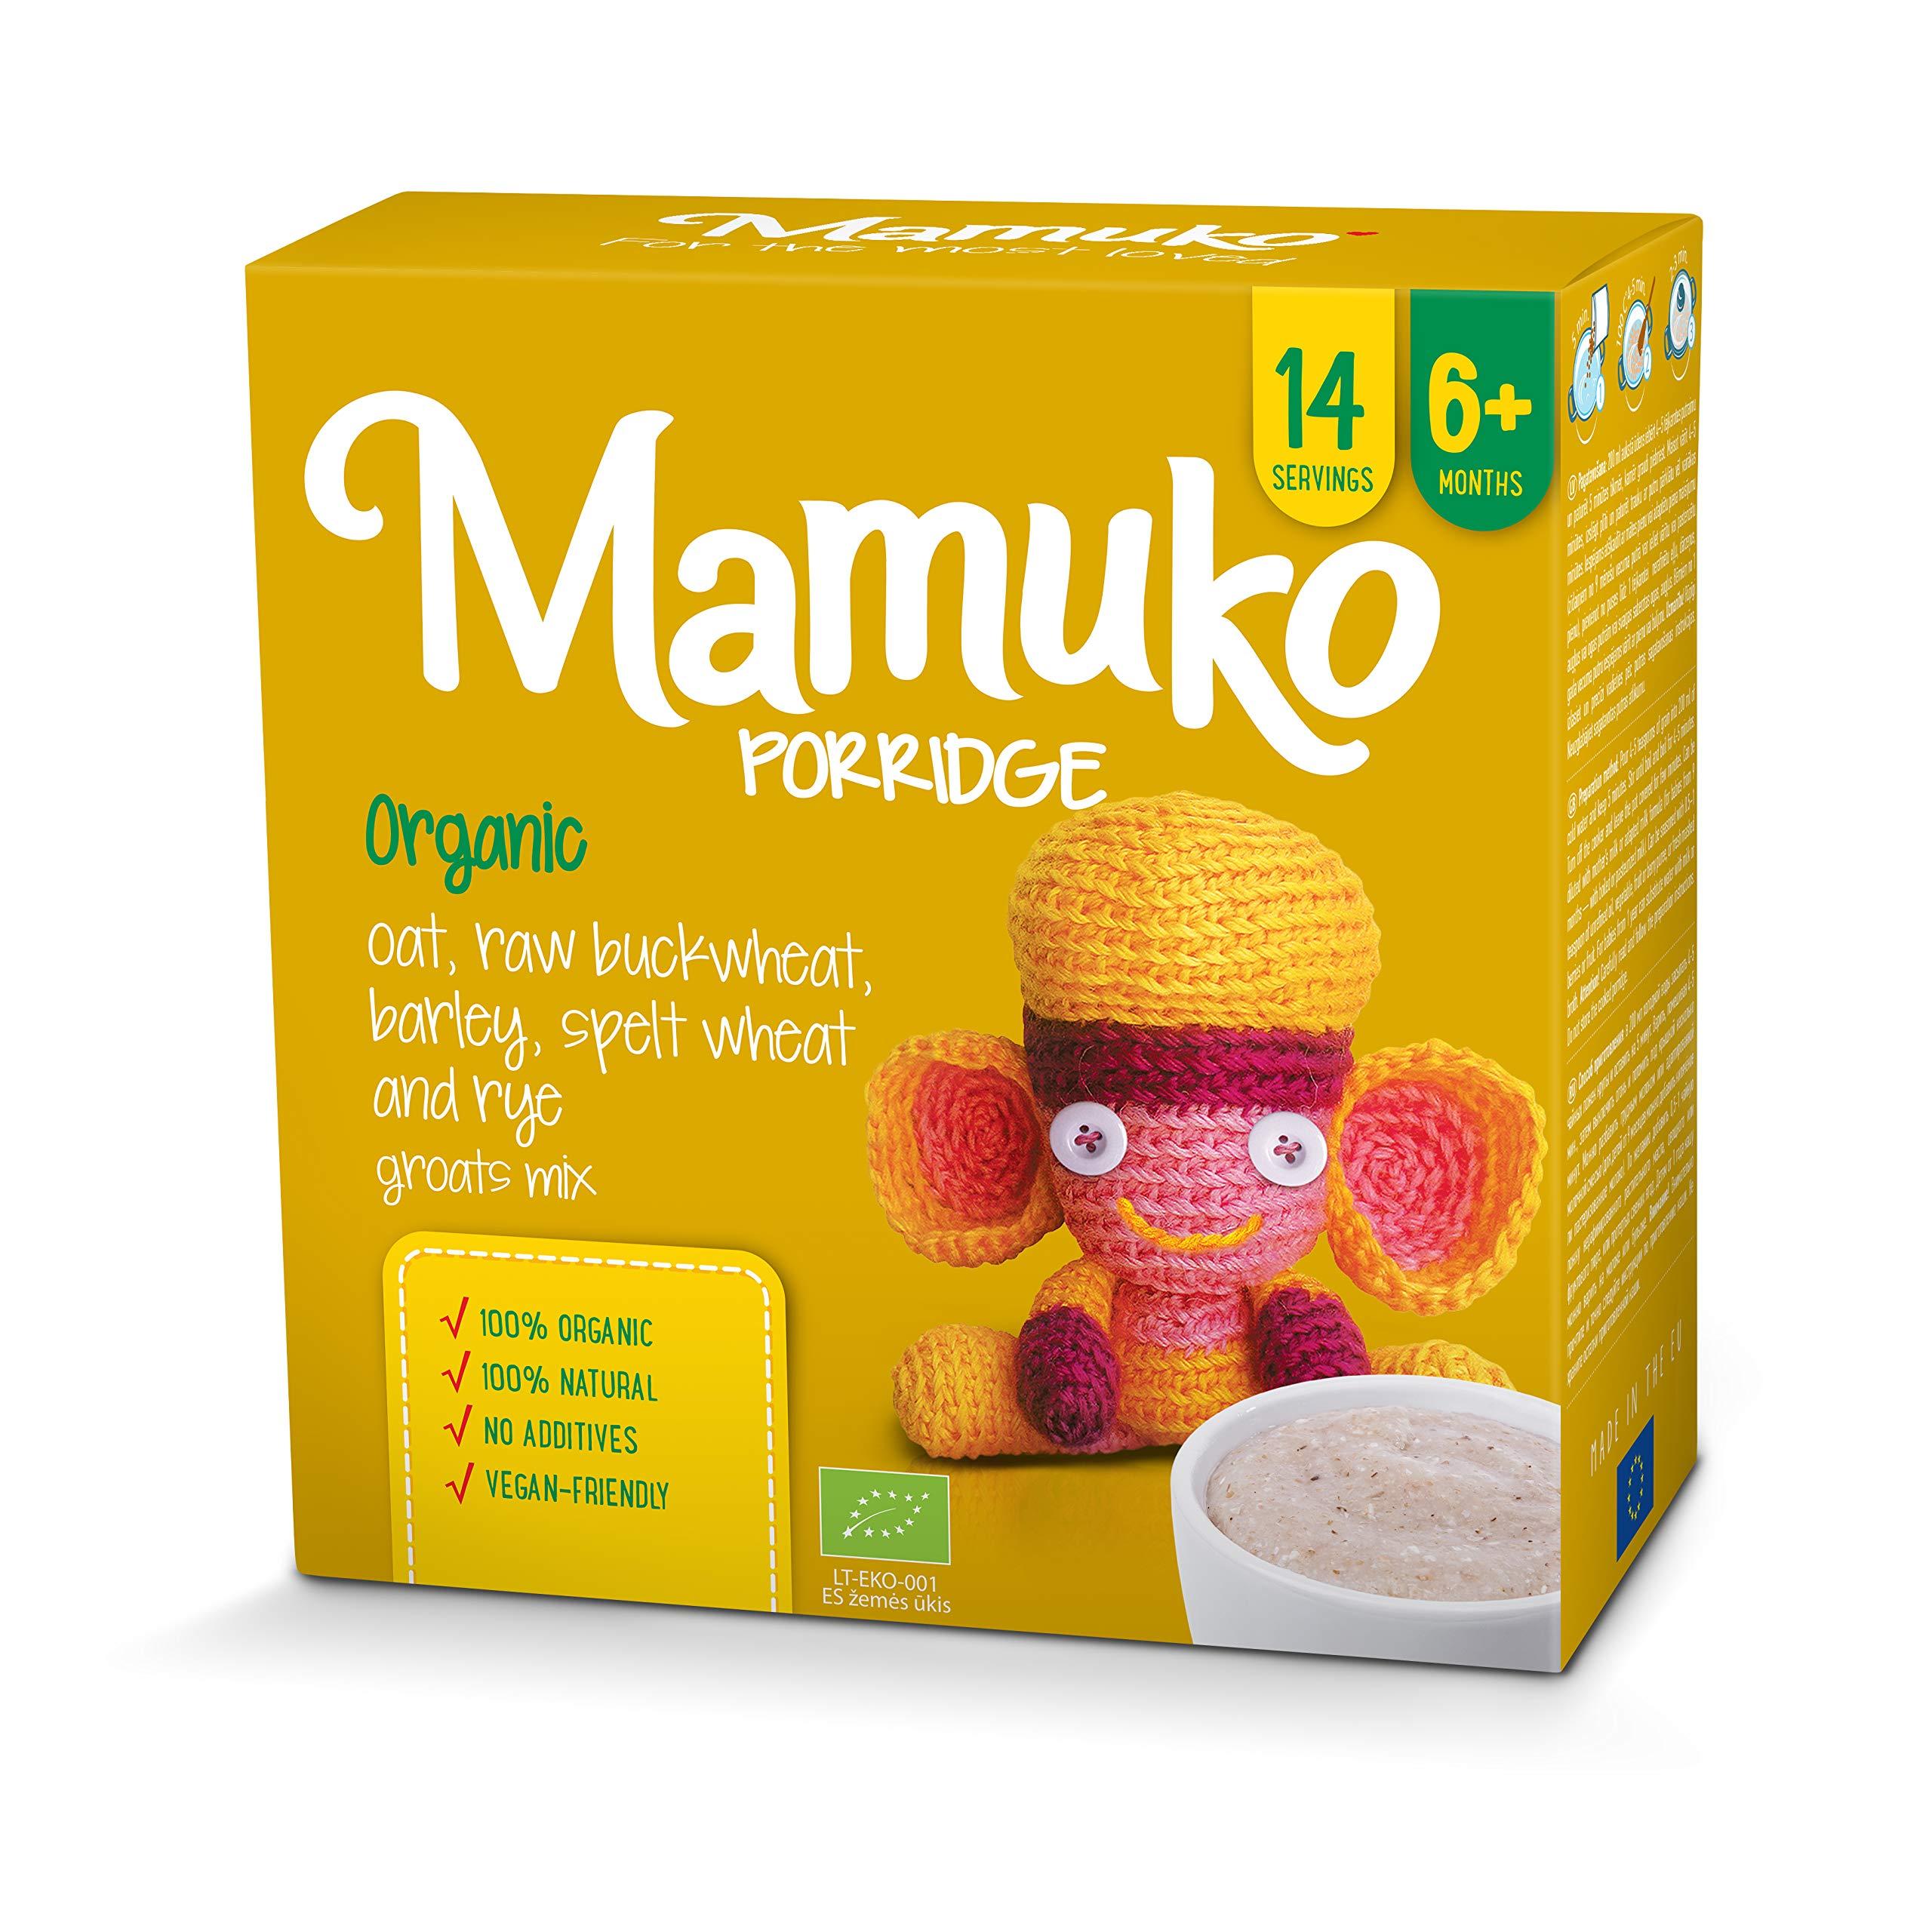 MAMUKO PORRIDGE - 5 Grain. Organic Mix of Oat, raw buckwheat, Barley, Spelt Wheat and rye Groats, 6+ Months